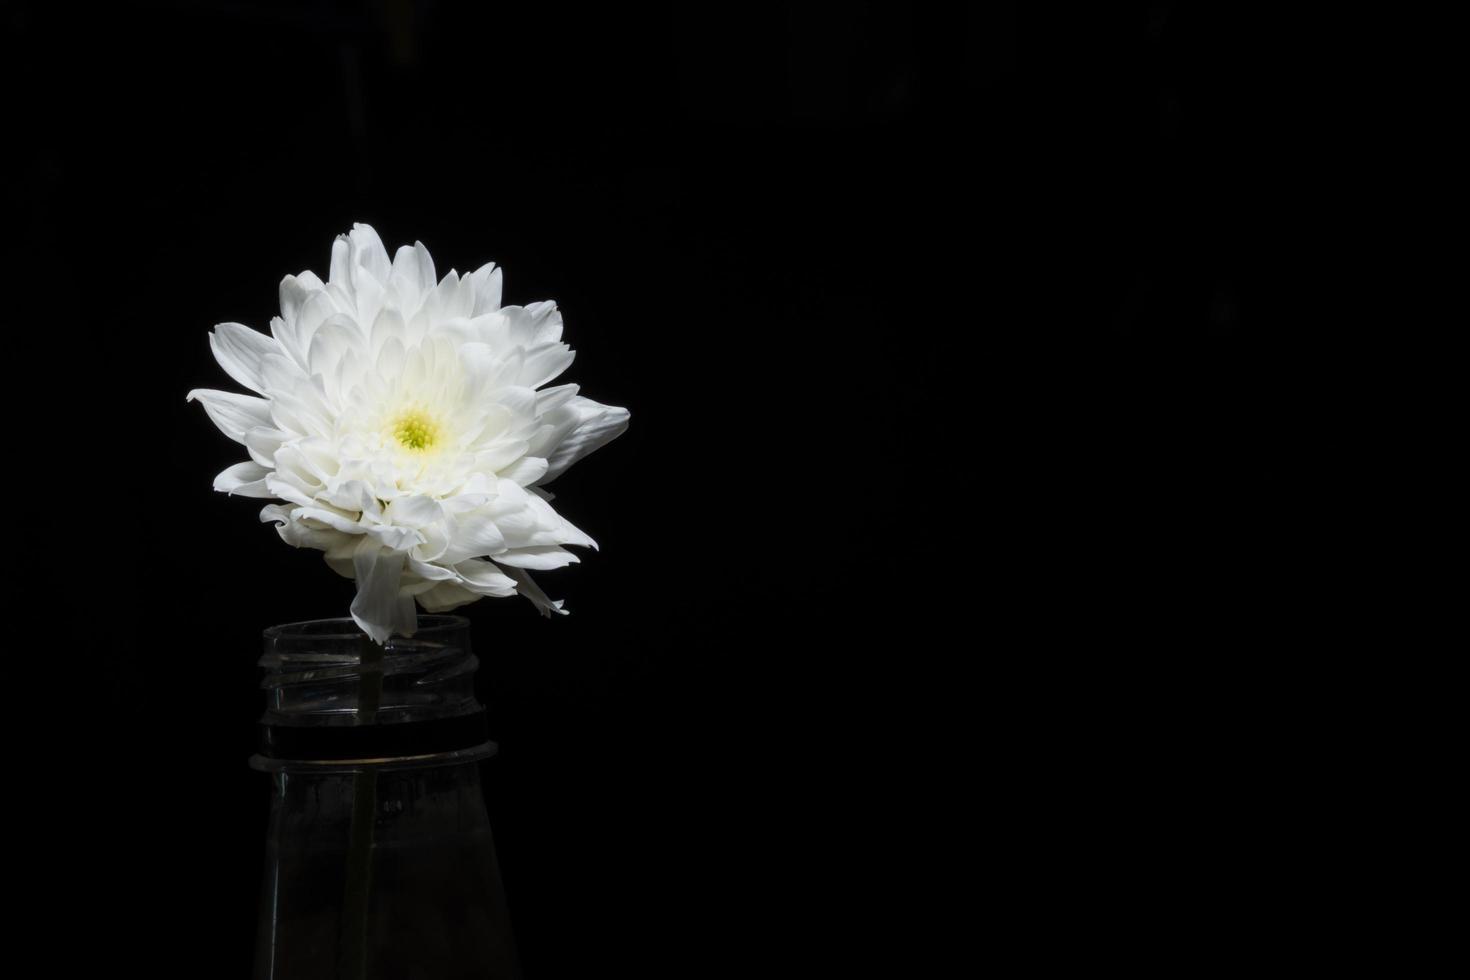 Flor de crisantemo blanco sobre fondo negro foto